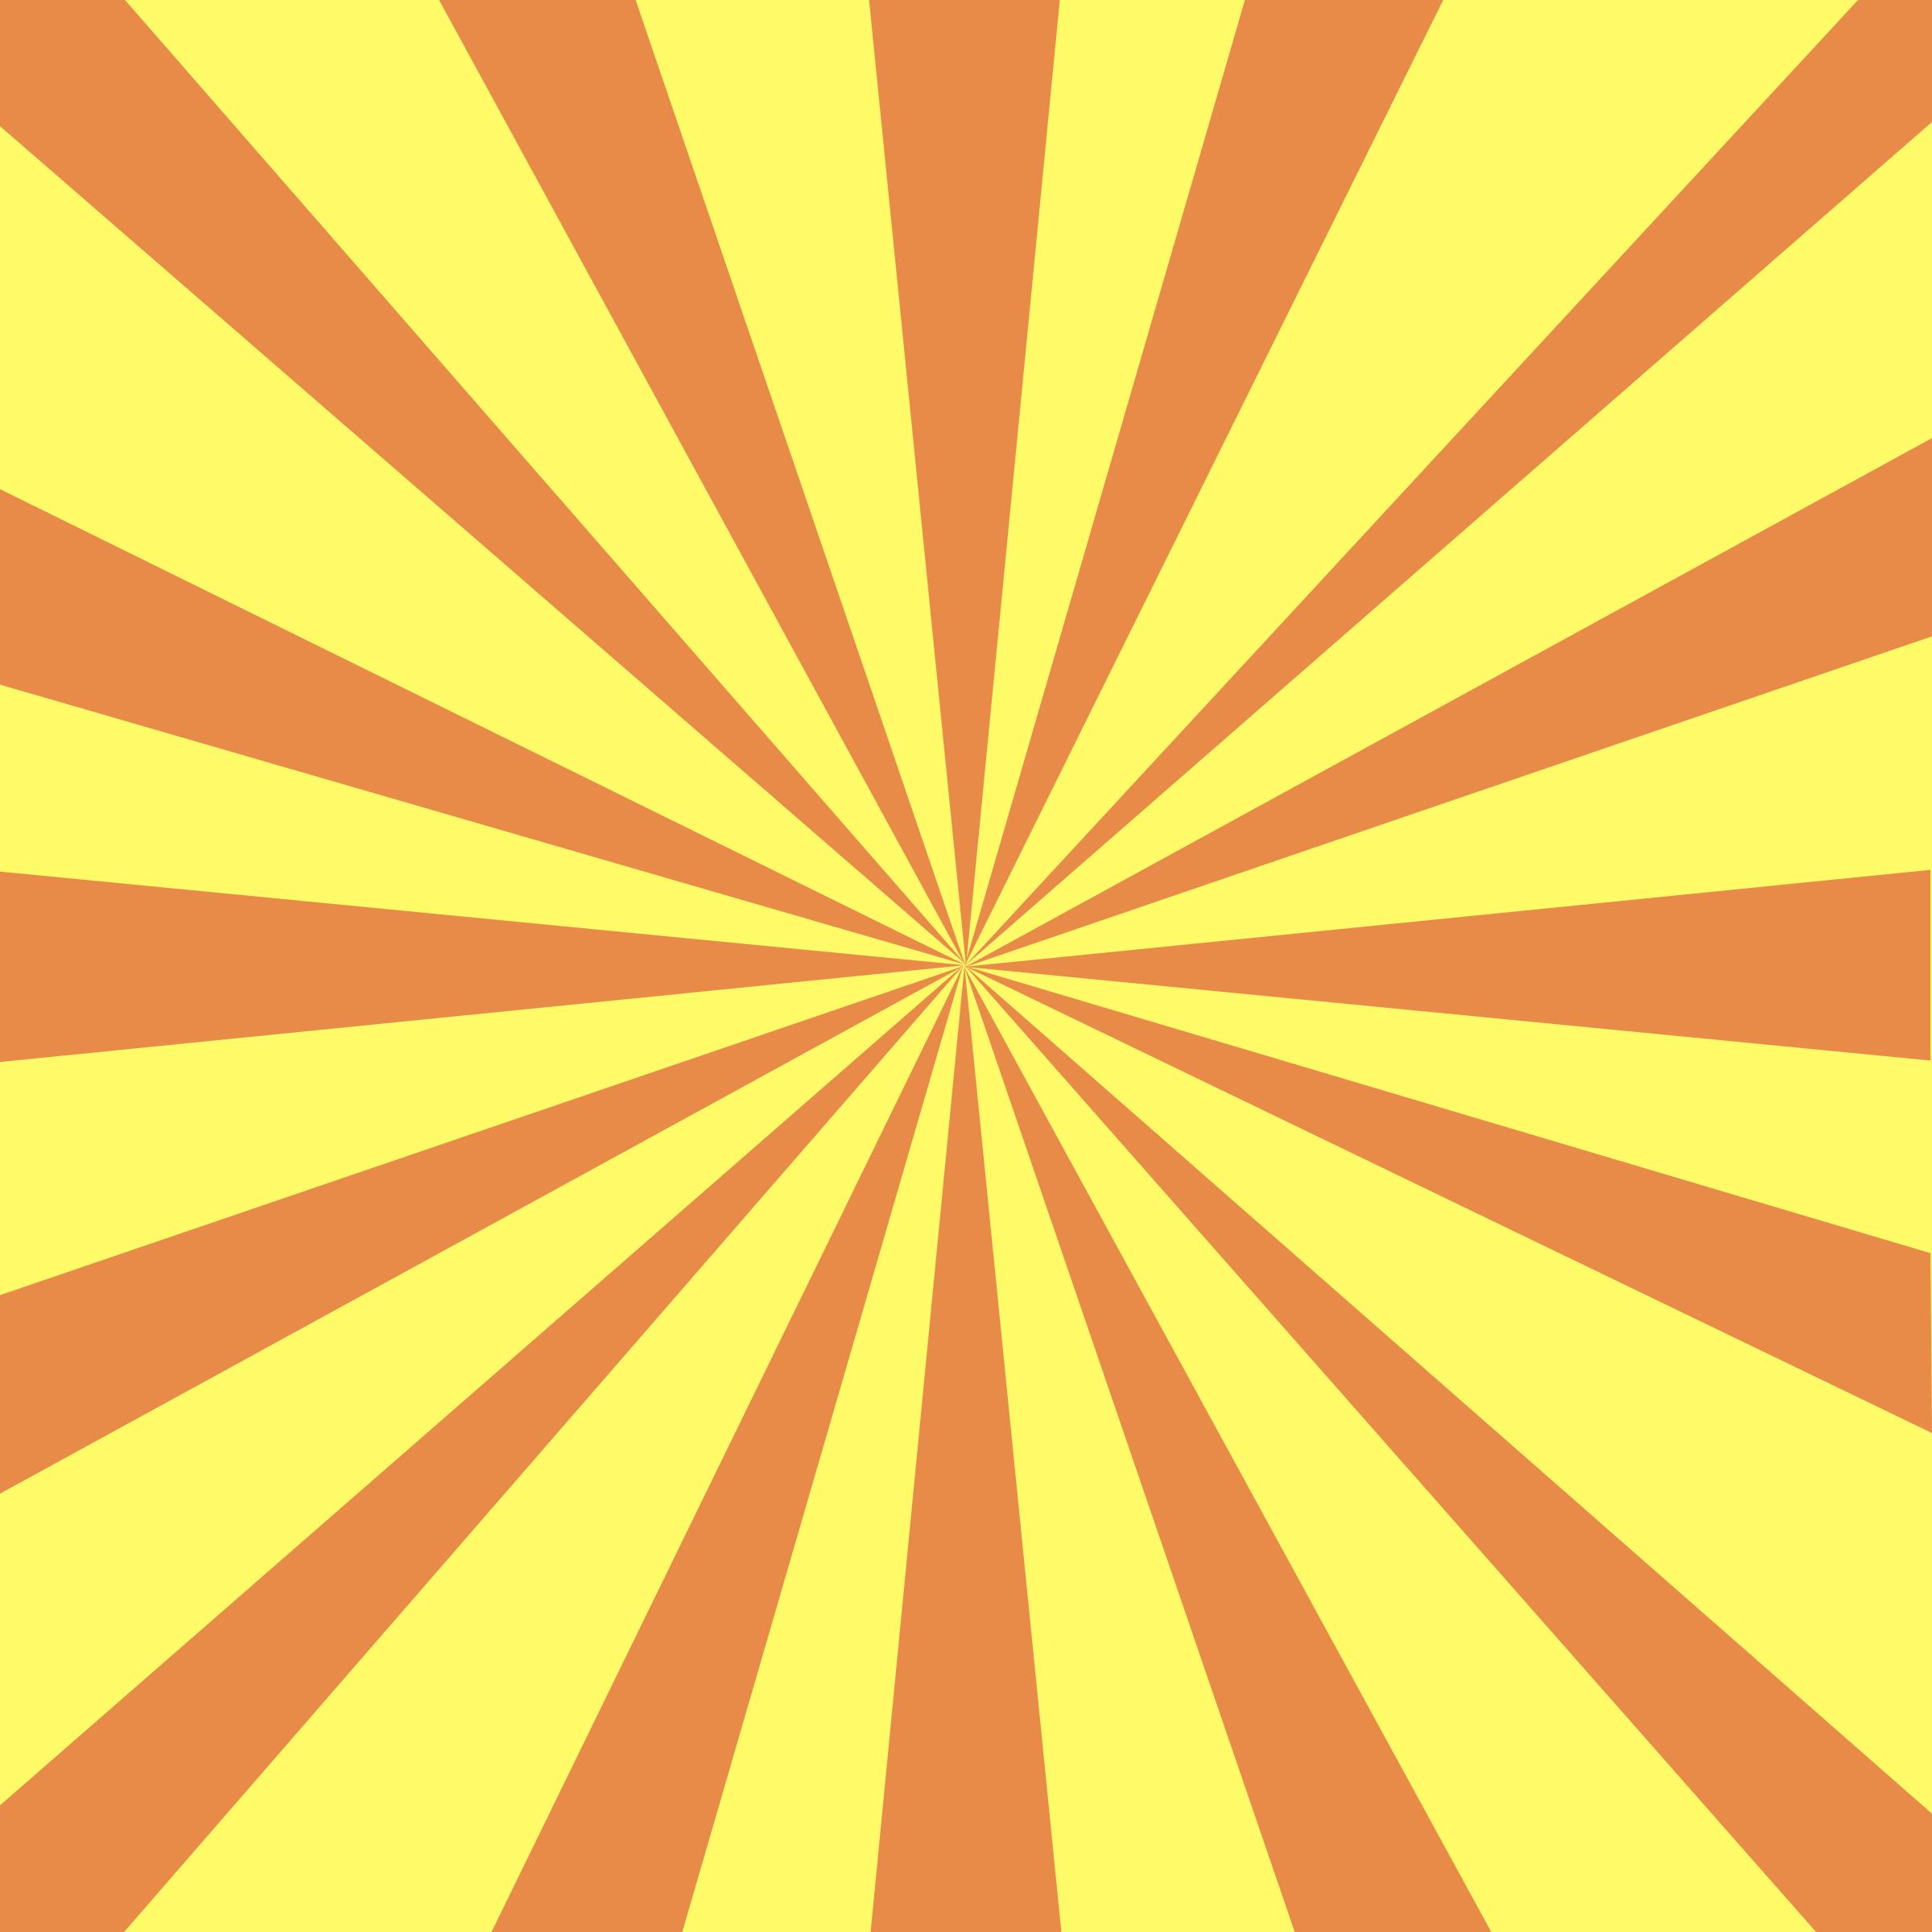 clipart meme highlight stripes  yellow  orange line clip art graphics canoe line clipart black